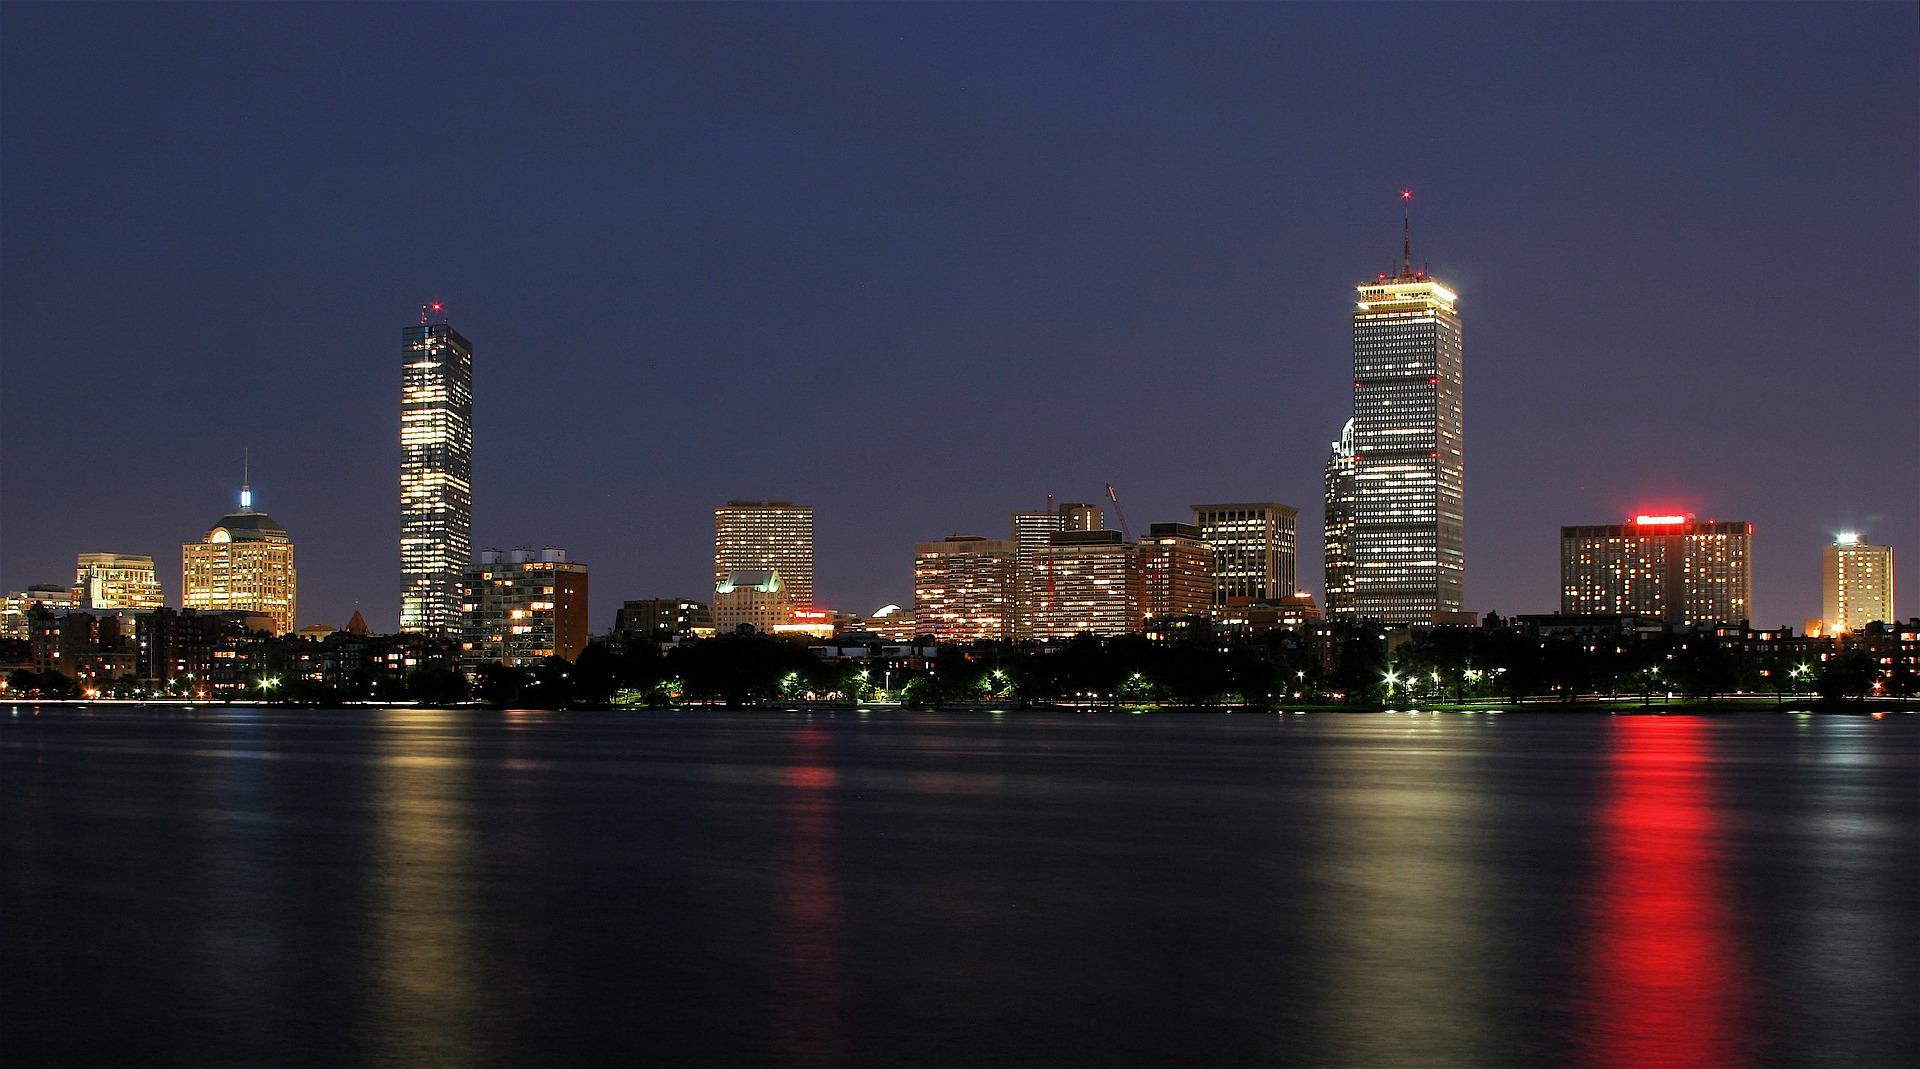 boston-592192_1920